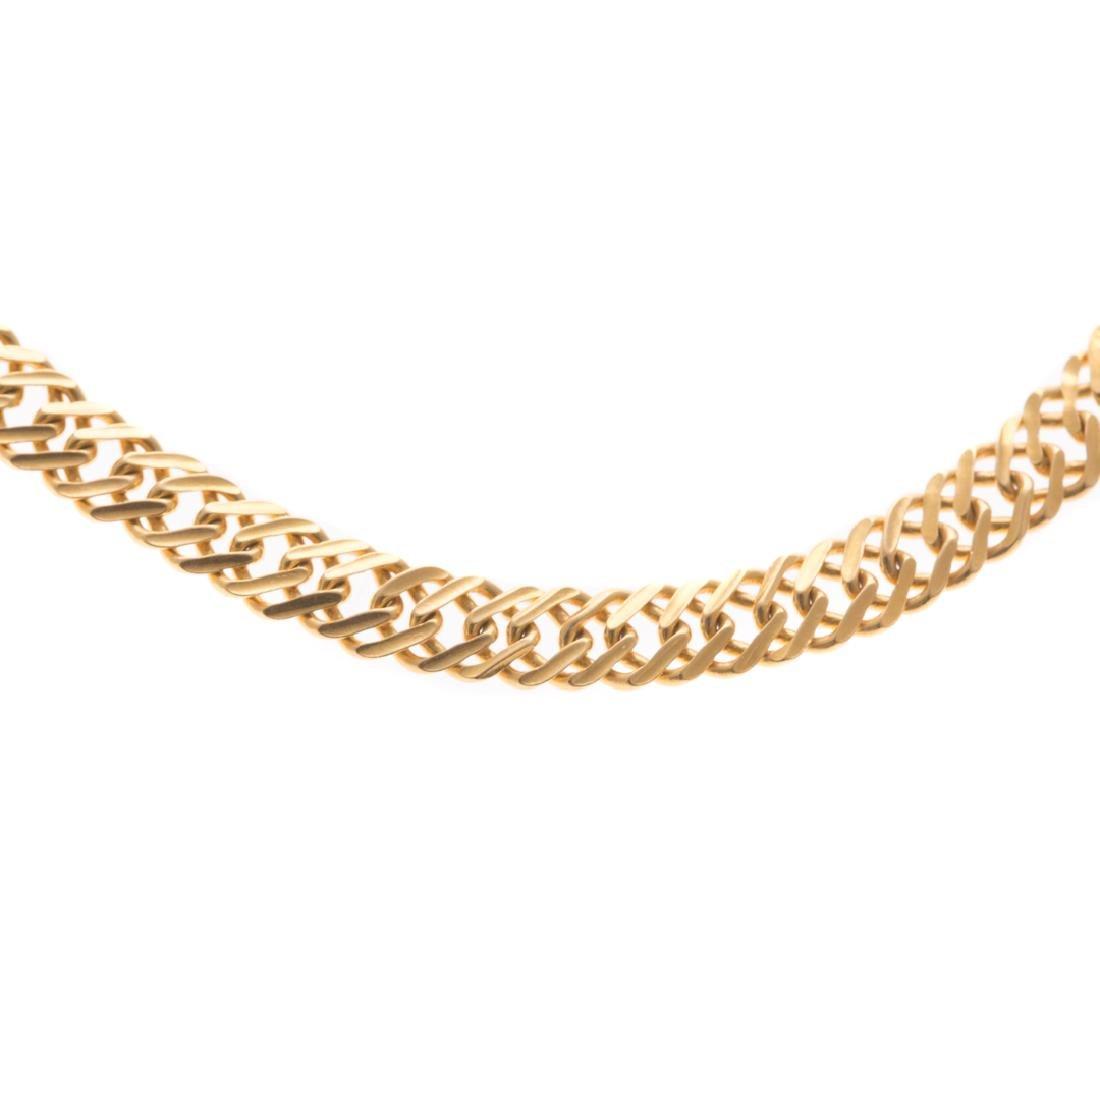 A Lady's 22K Flat Curbed Link Bracelet - 2